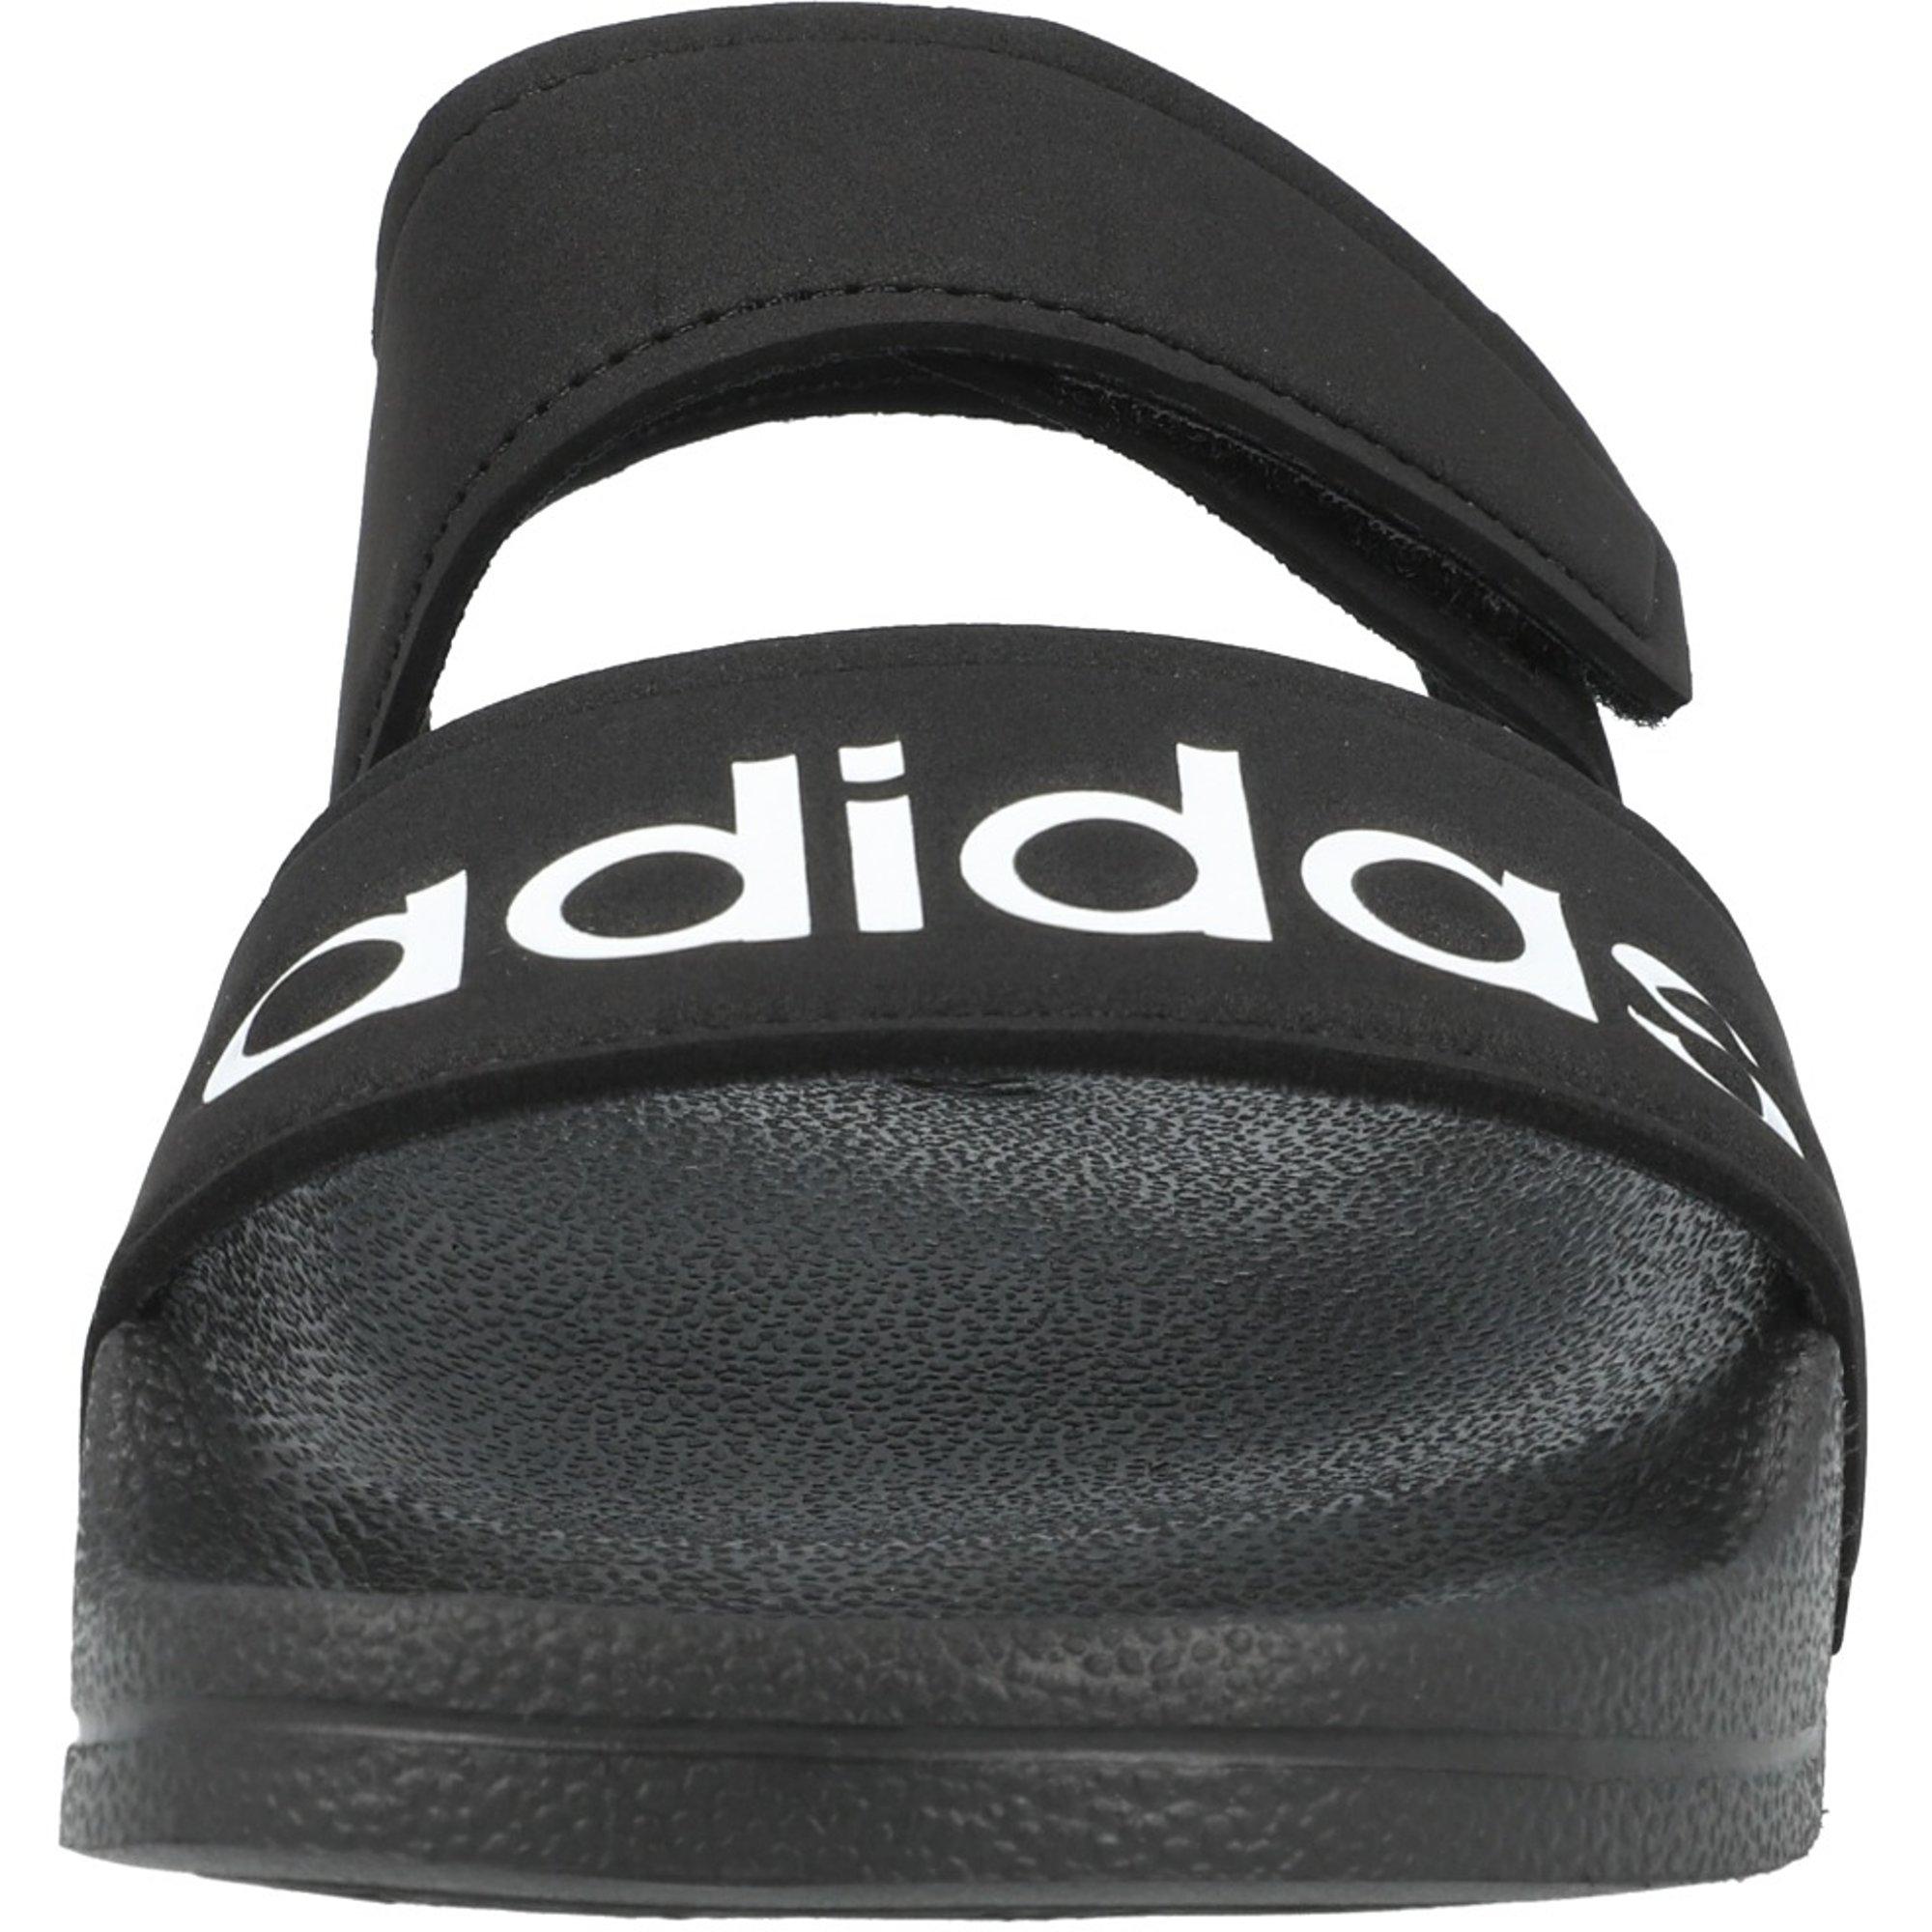 adidas adilette Sandal K Core Black/White Synthetic